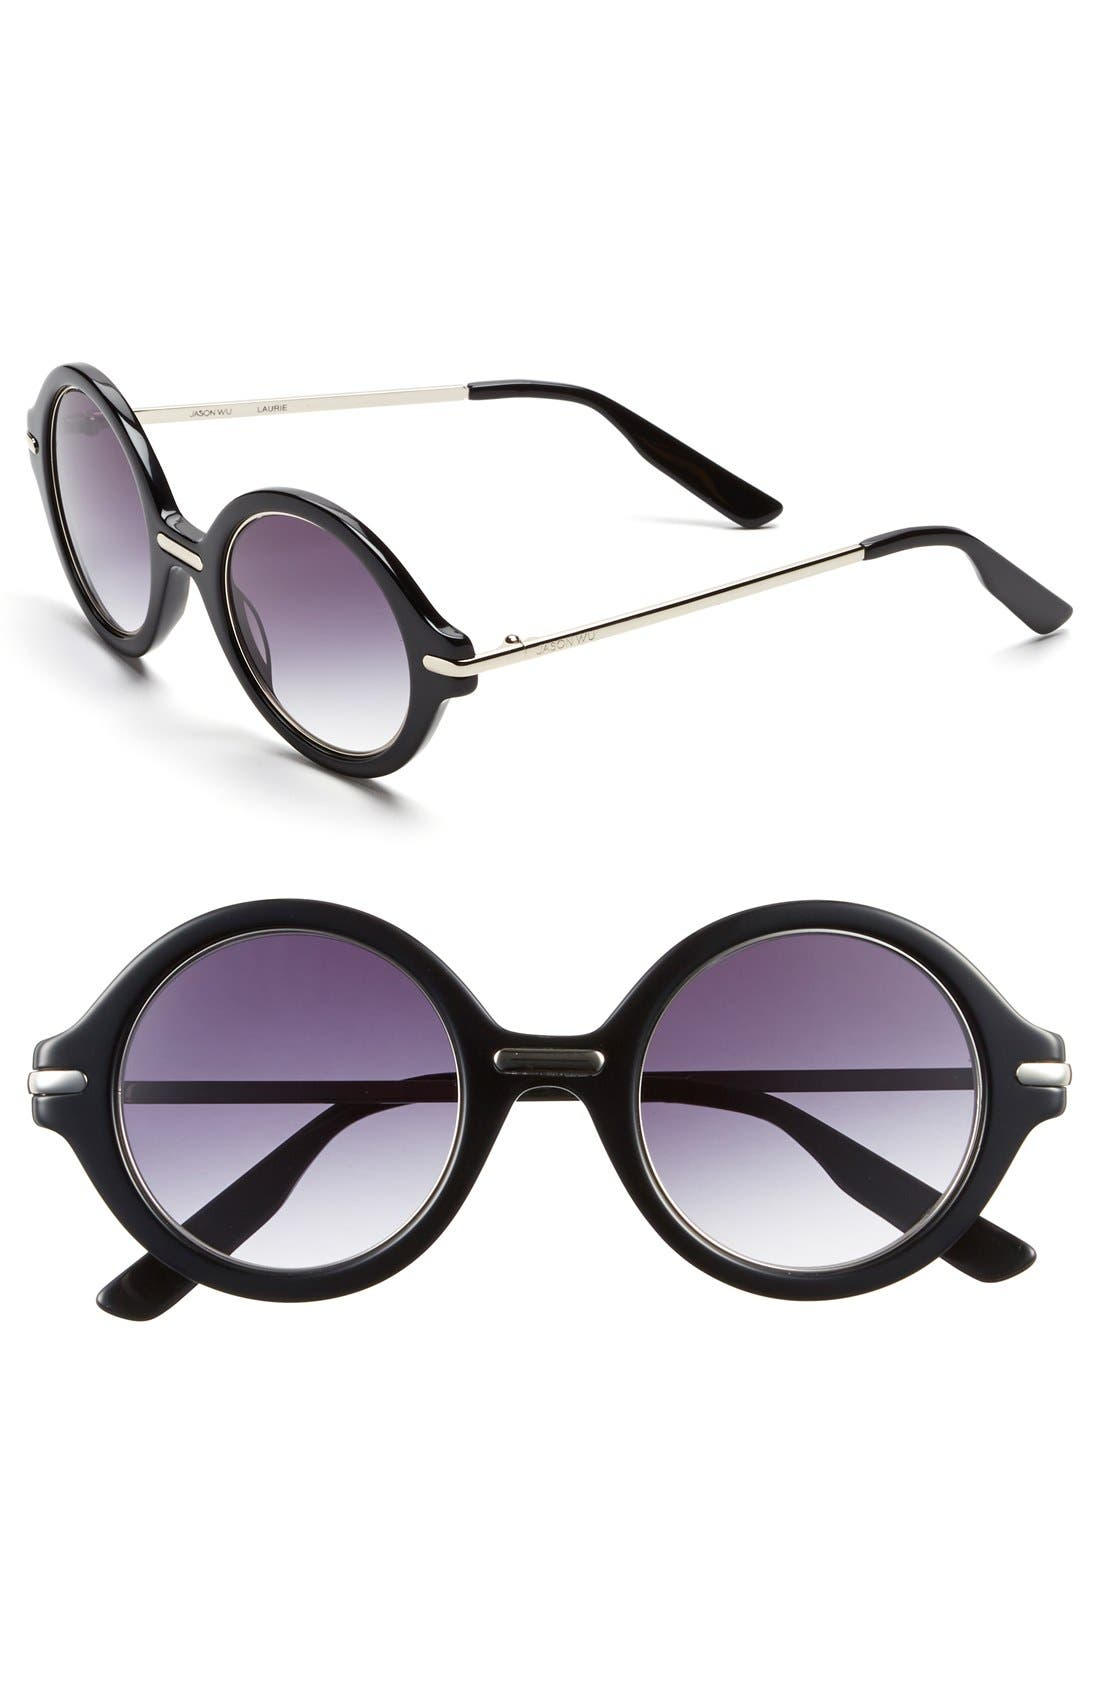 Jason Wu 'Laurie' 46mm Sunglasses, Main, color, 001